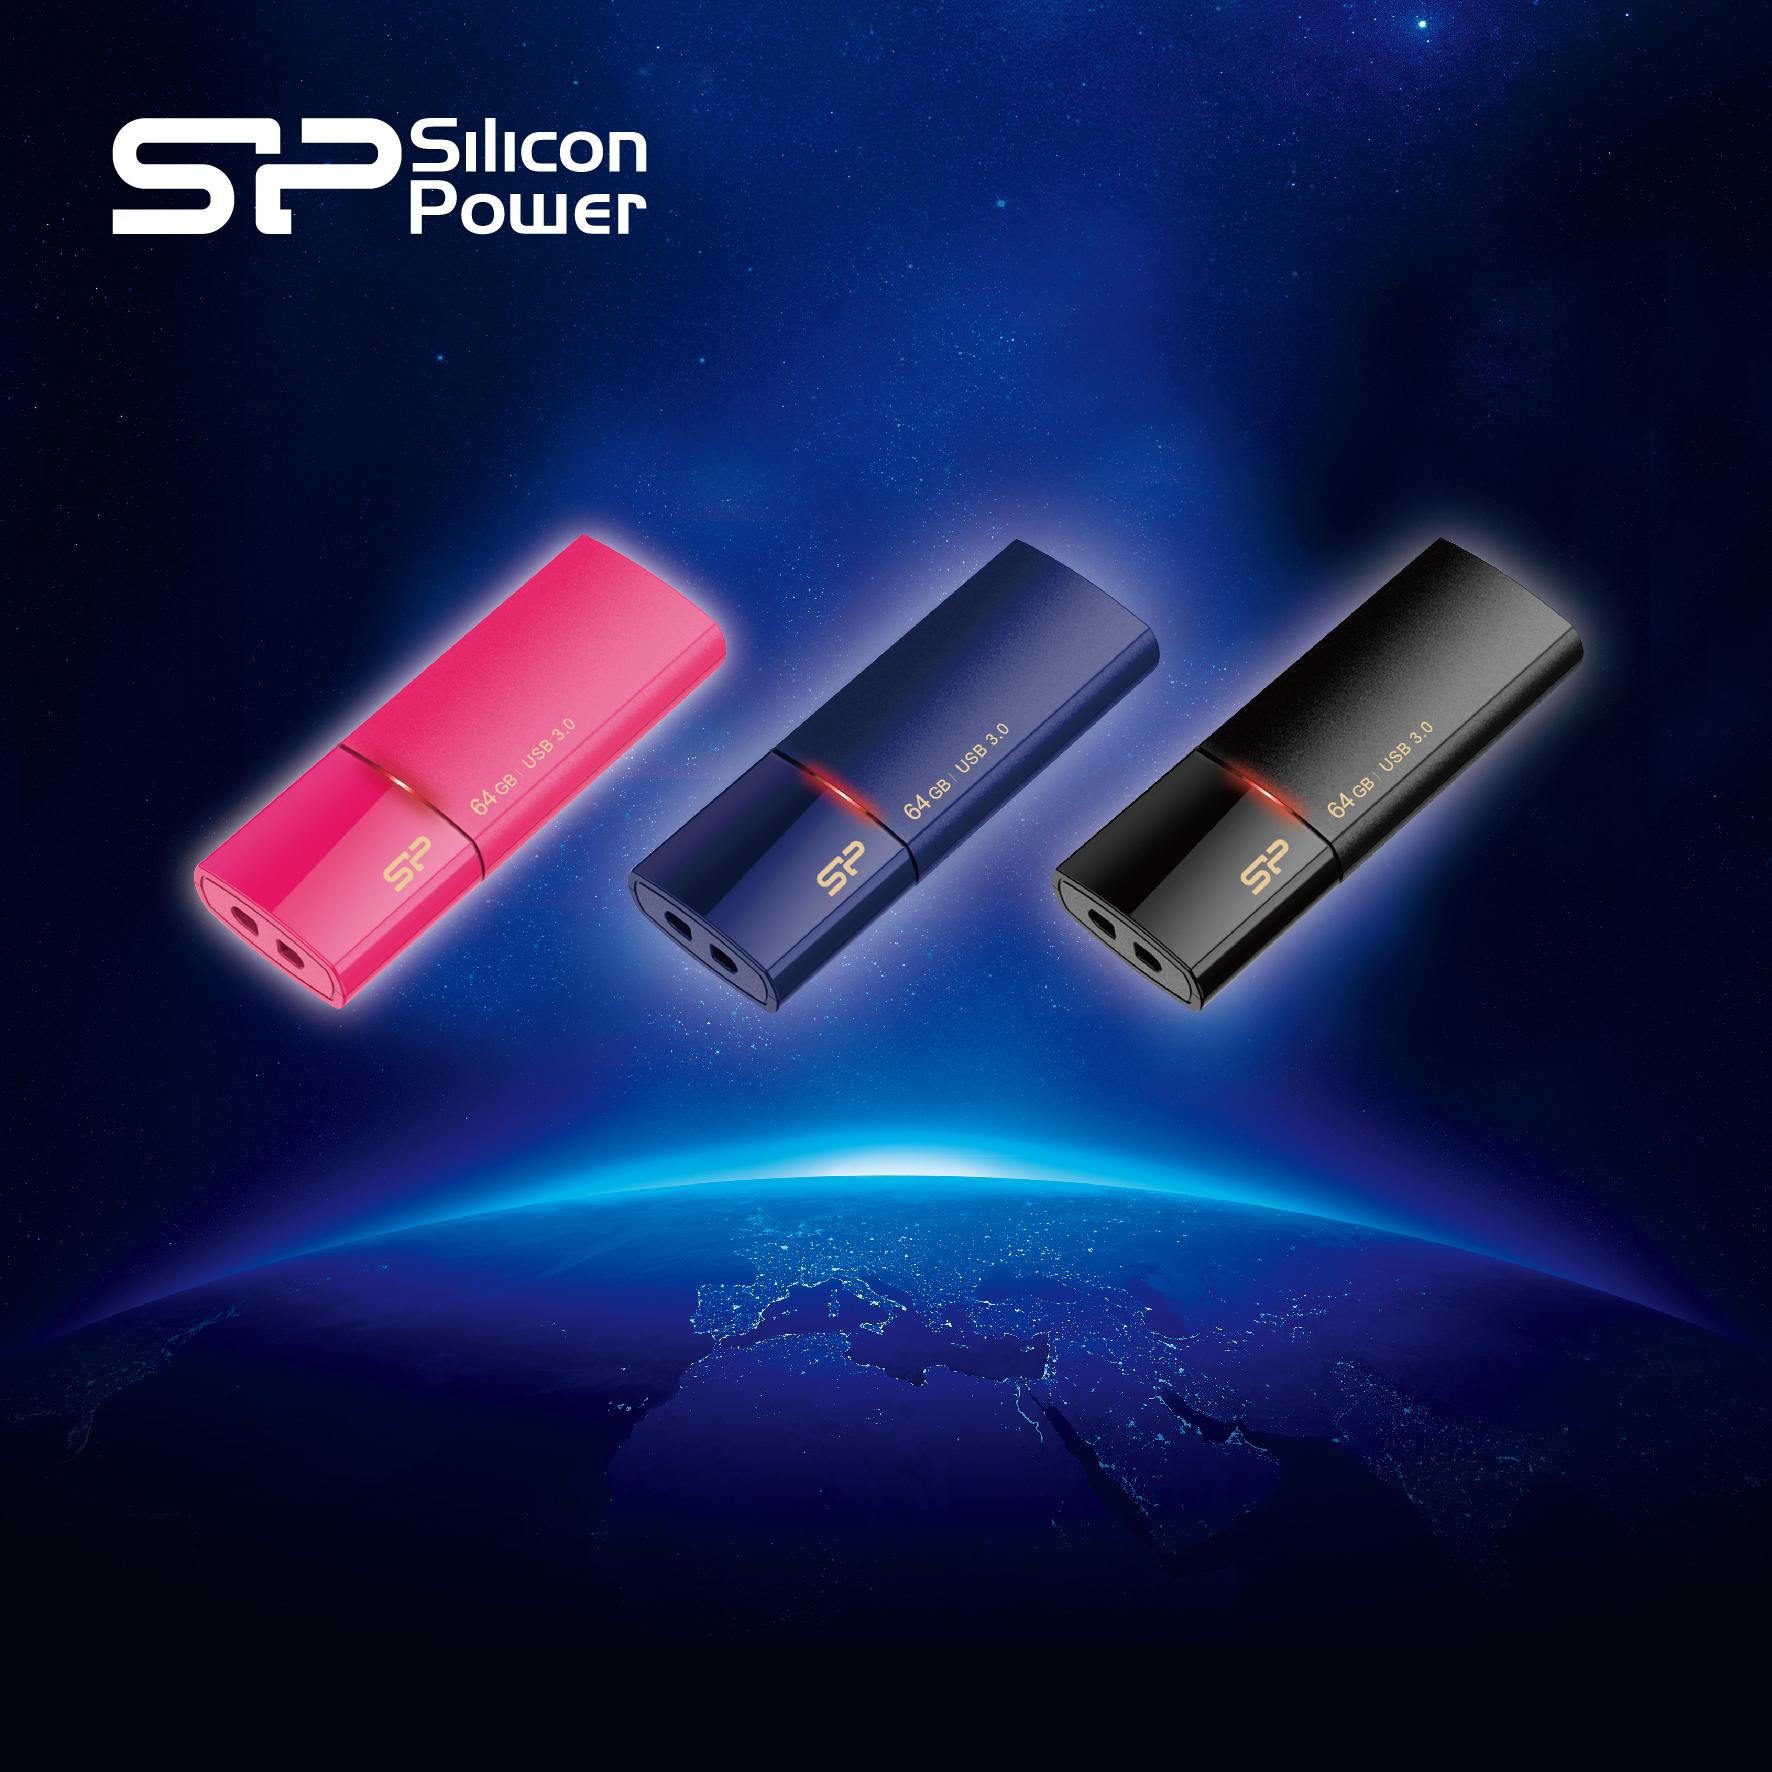 "SP廣穎電通 USB 2.0 Ultima U05 & USB 3.0 Blaze B05隨身碟 -指尖輕科技 繽紛靚時尚"" style="